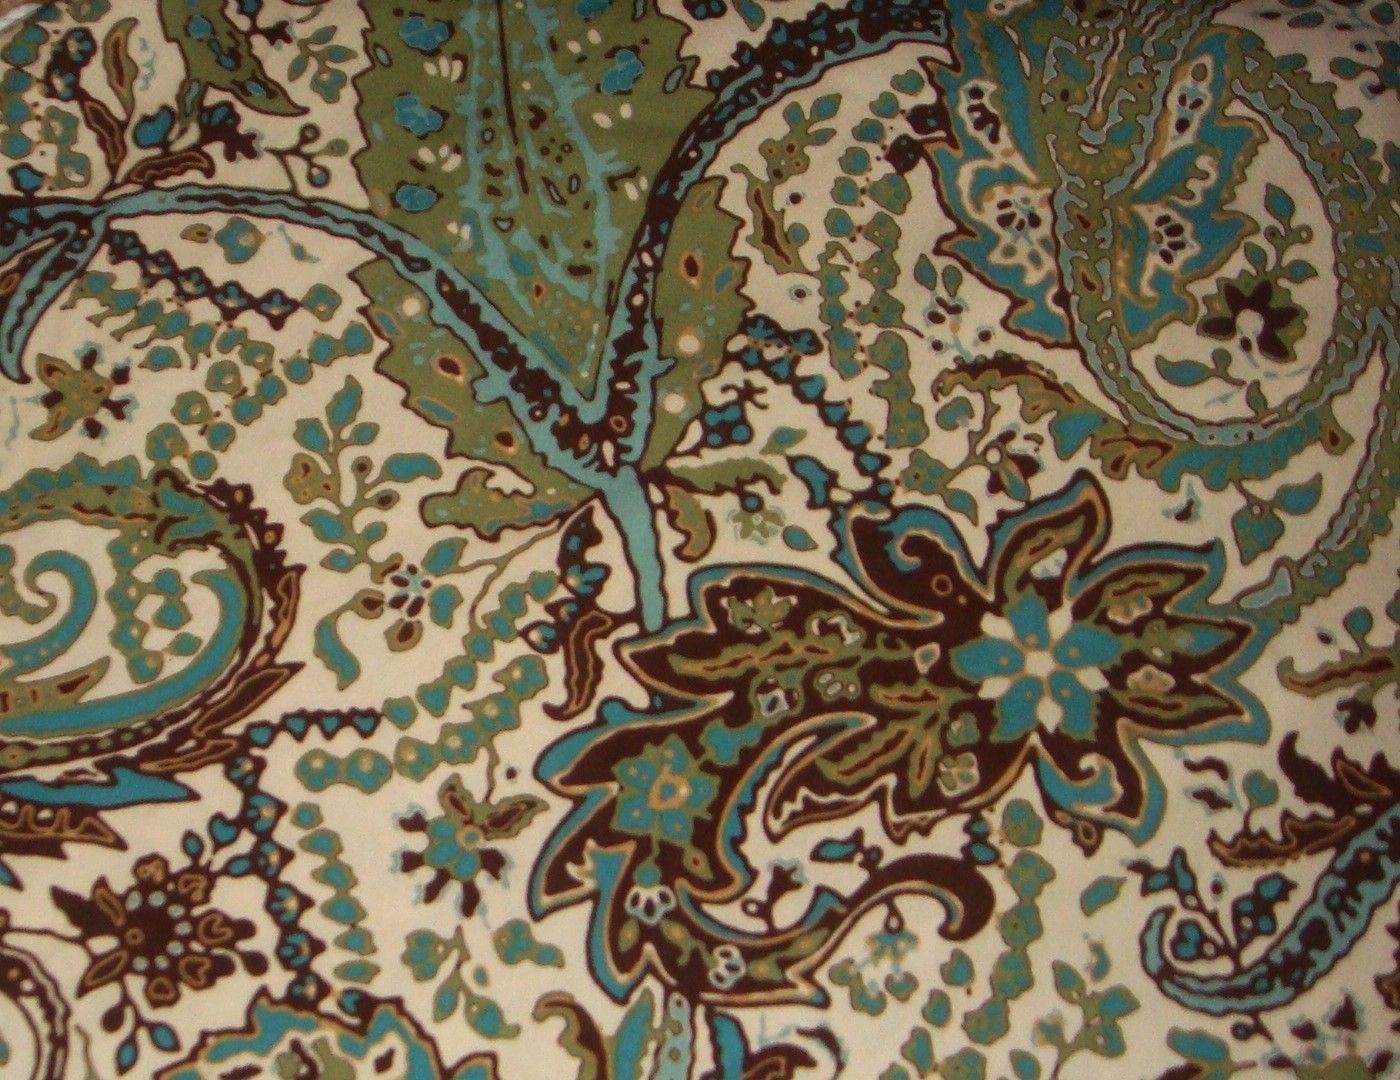 Threshold Paisley Green Teal Blue Cream Brown Fabric